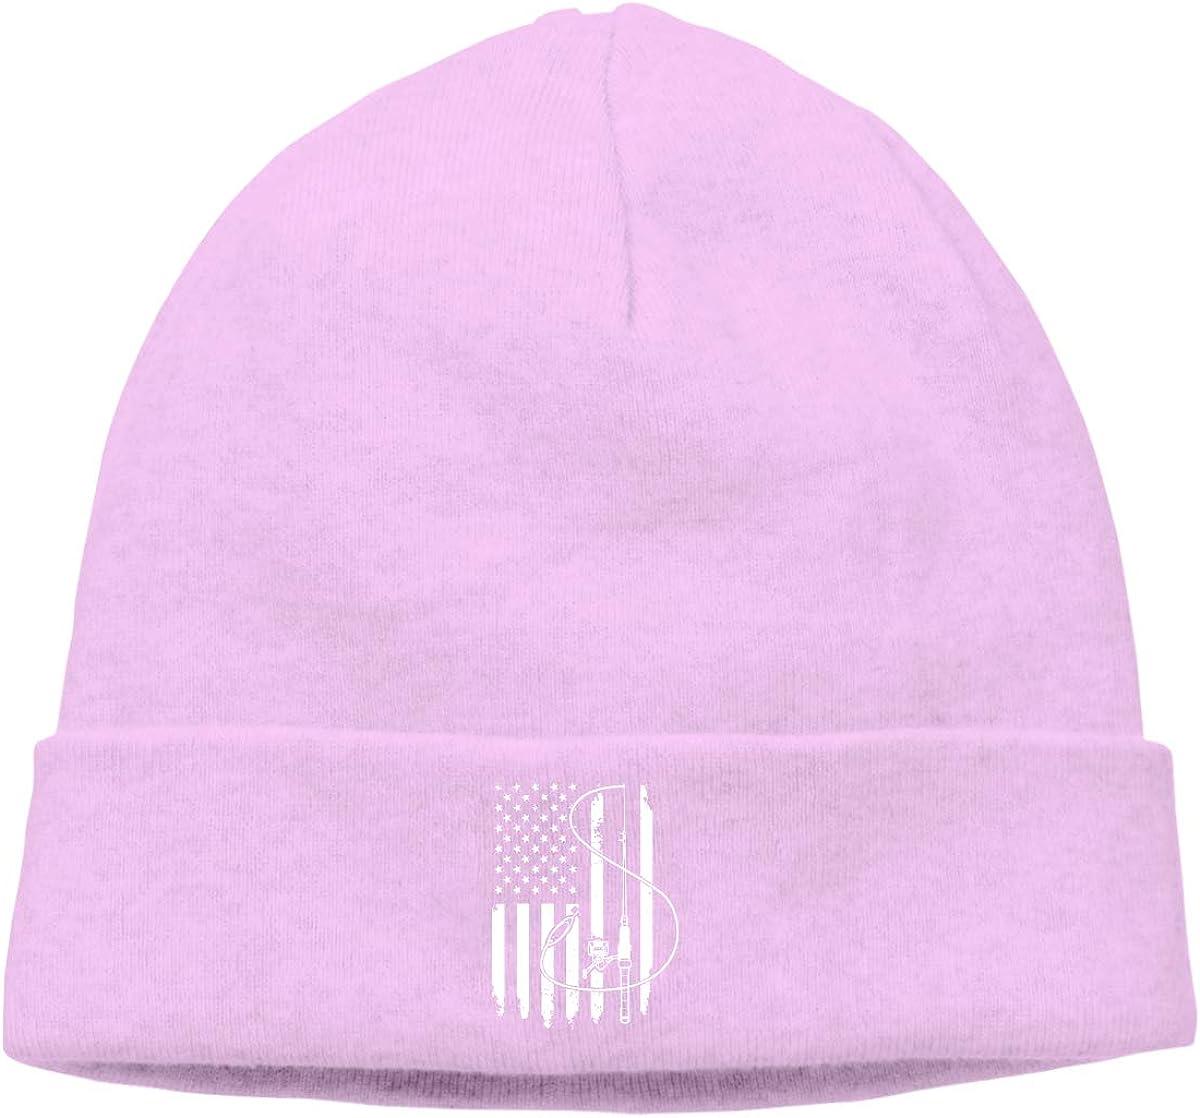 Fishing Fish Flag DFKD JKFD Unisex Knitted Hat Skull Hat Beanie Cap for Mens and Womens